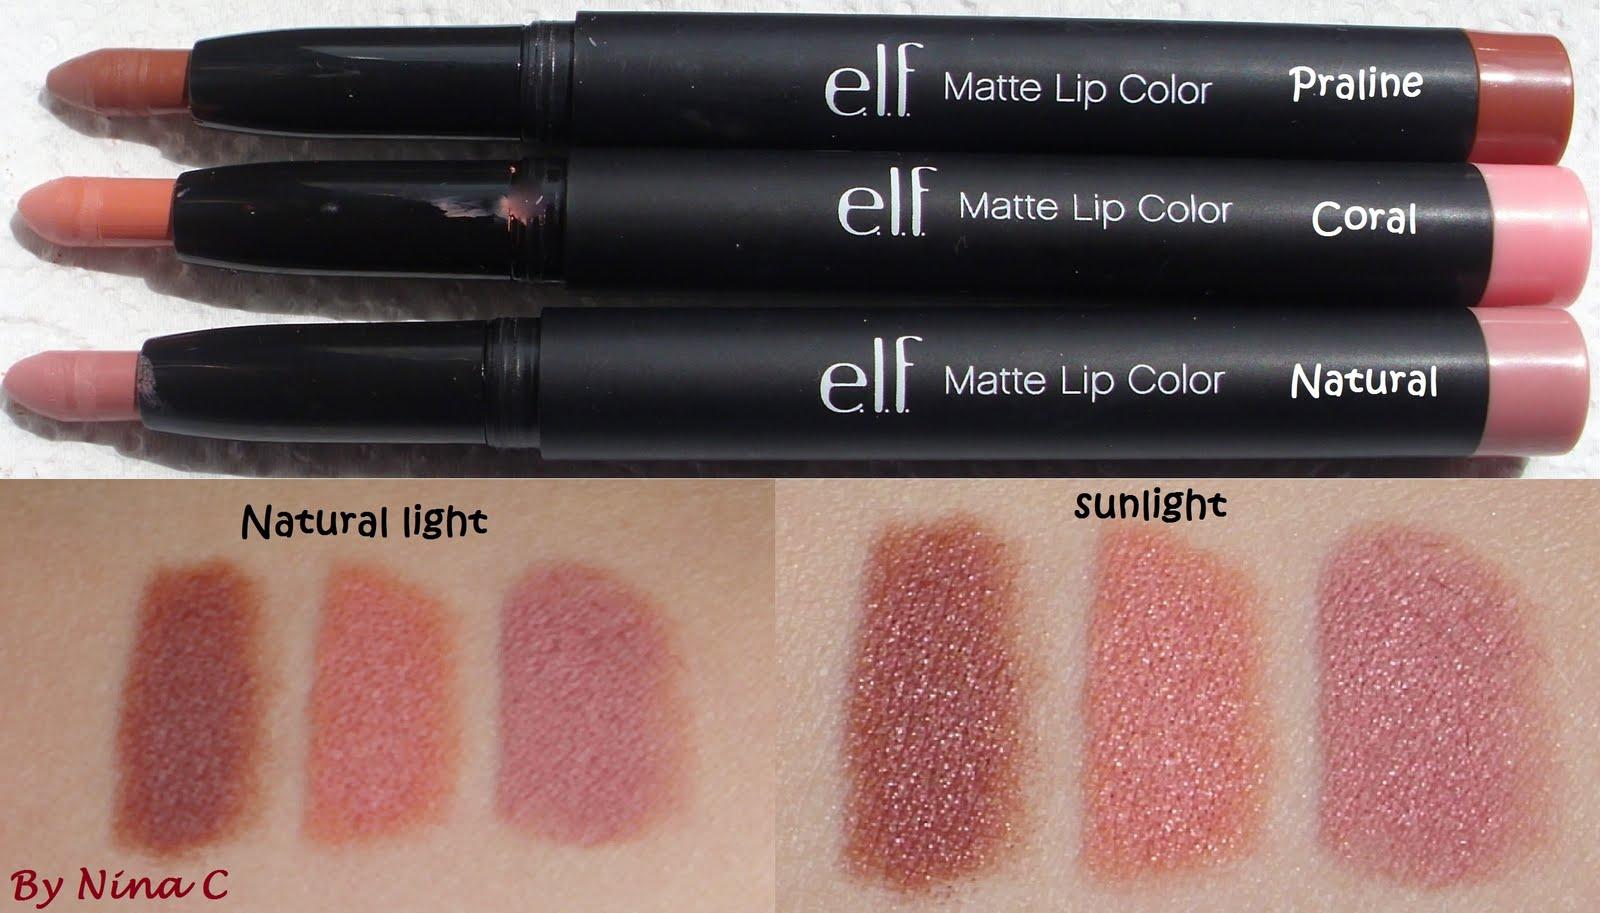 Elf Matte Lip Color Natural Review